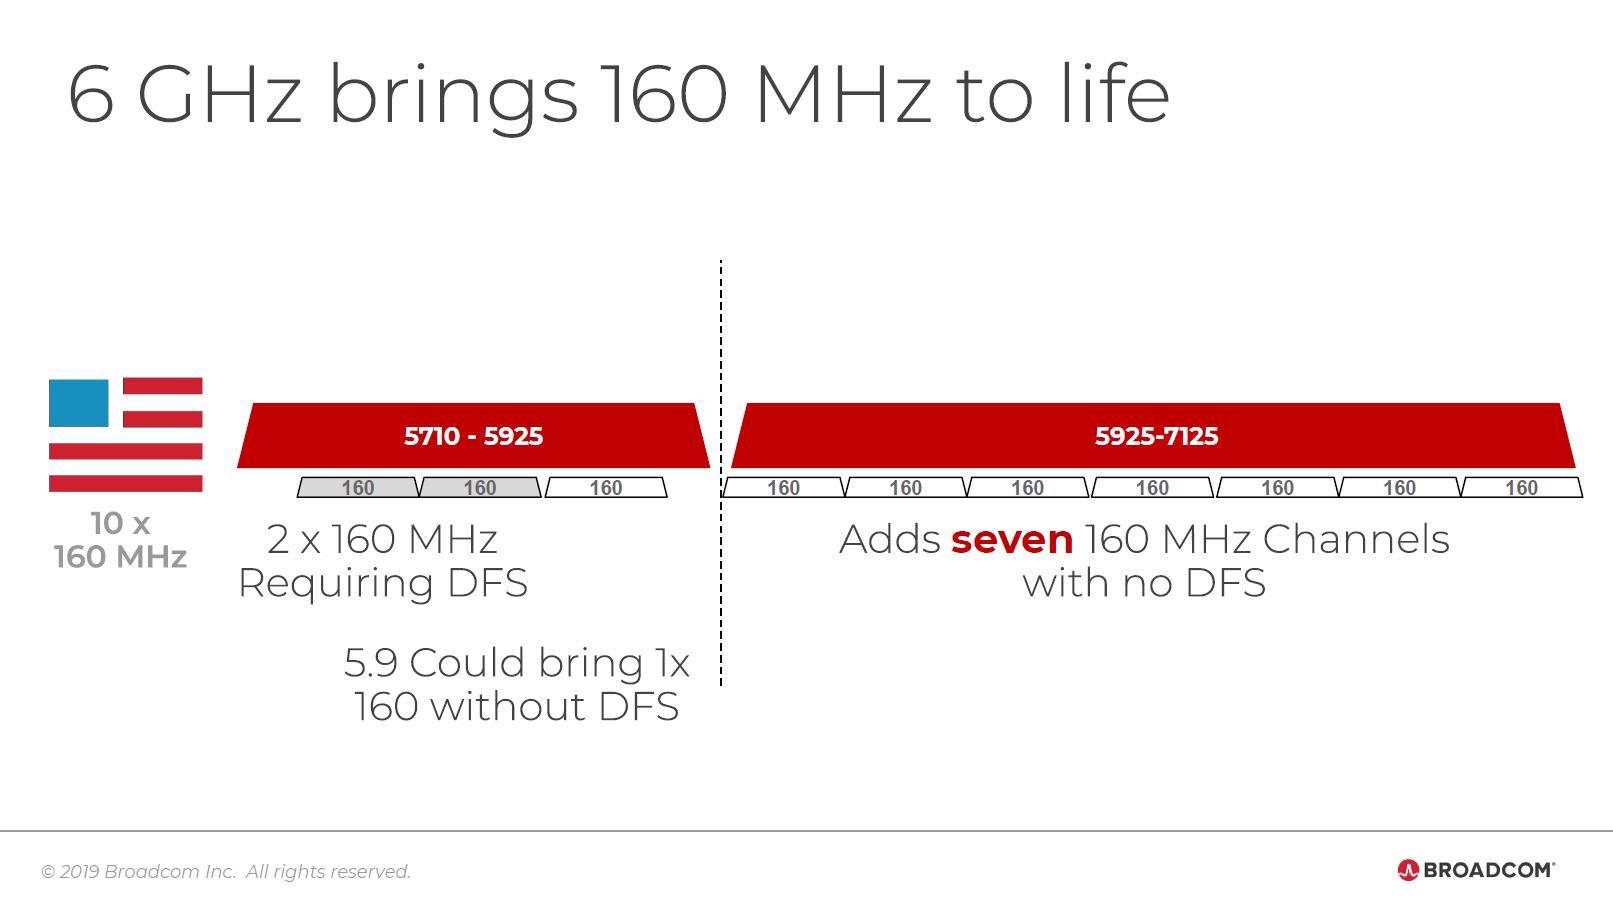 Wi-Fi 6E/藍牙 5.0 行動版整合式晶片先出爐!博通推出 BCM4389 支援 160MHz 頻寬